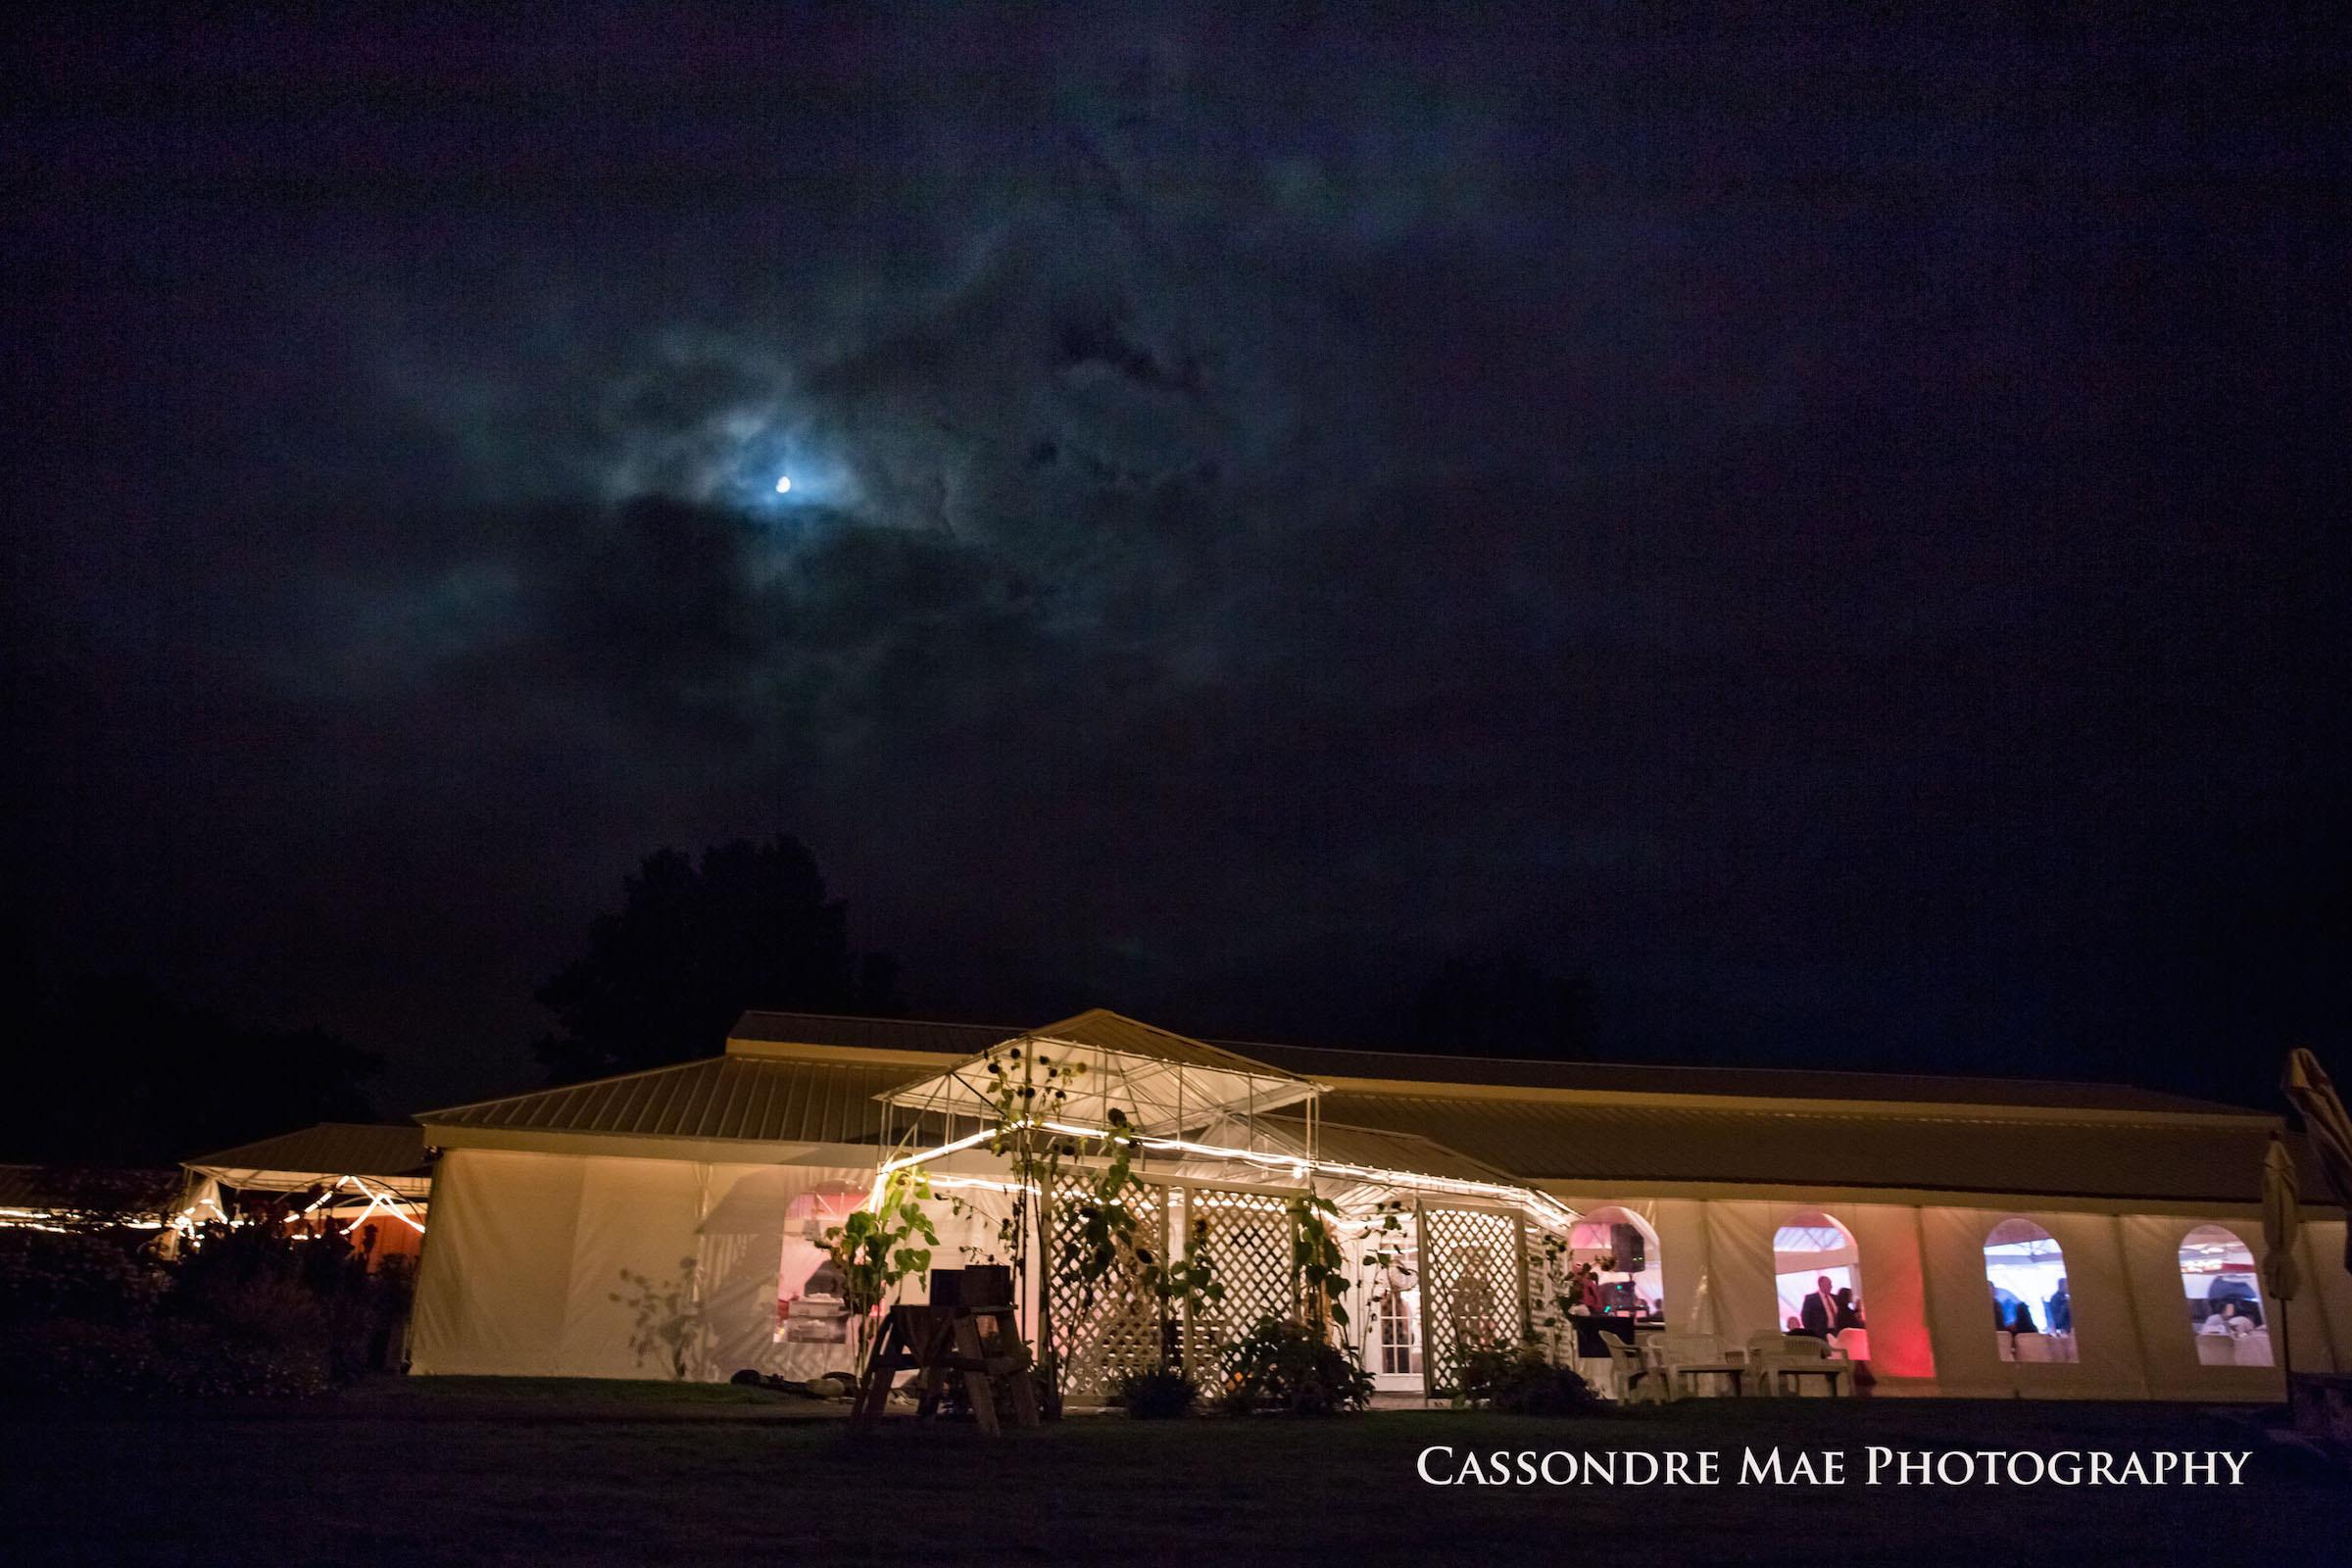 Cassondre Mae Photography 20.jpg